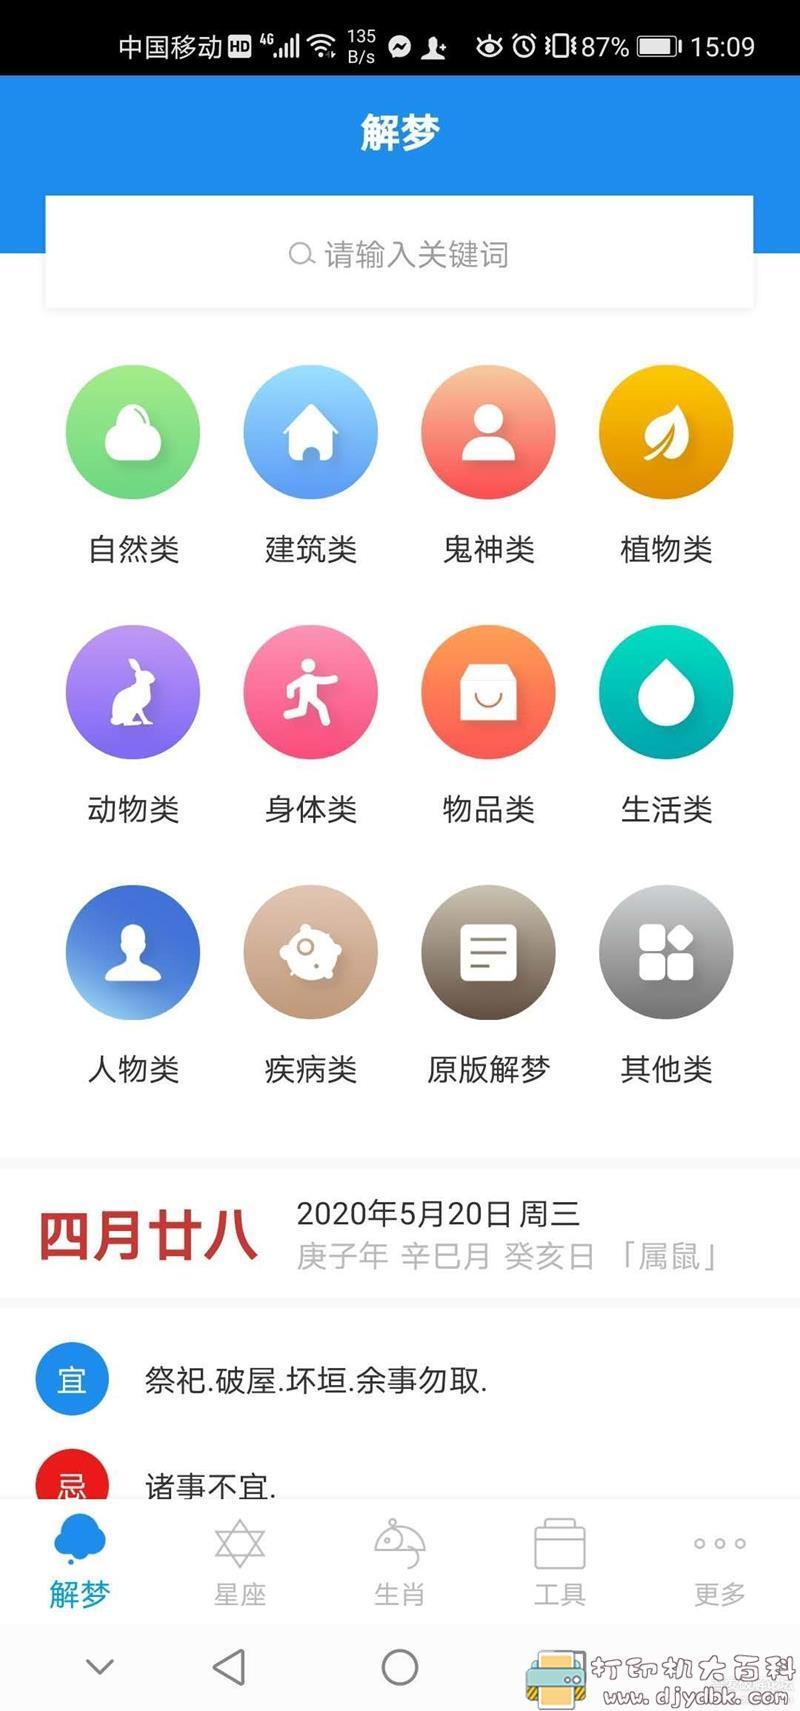 [Android]【周公解梦app】解梦预测图片 No.4